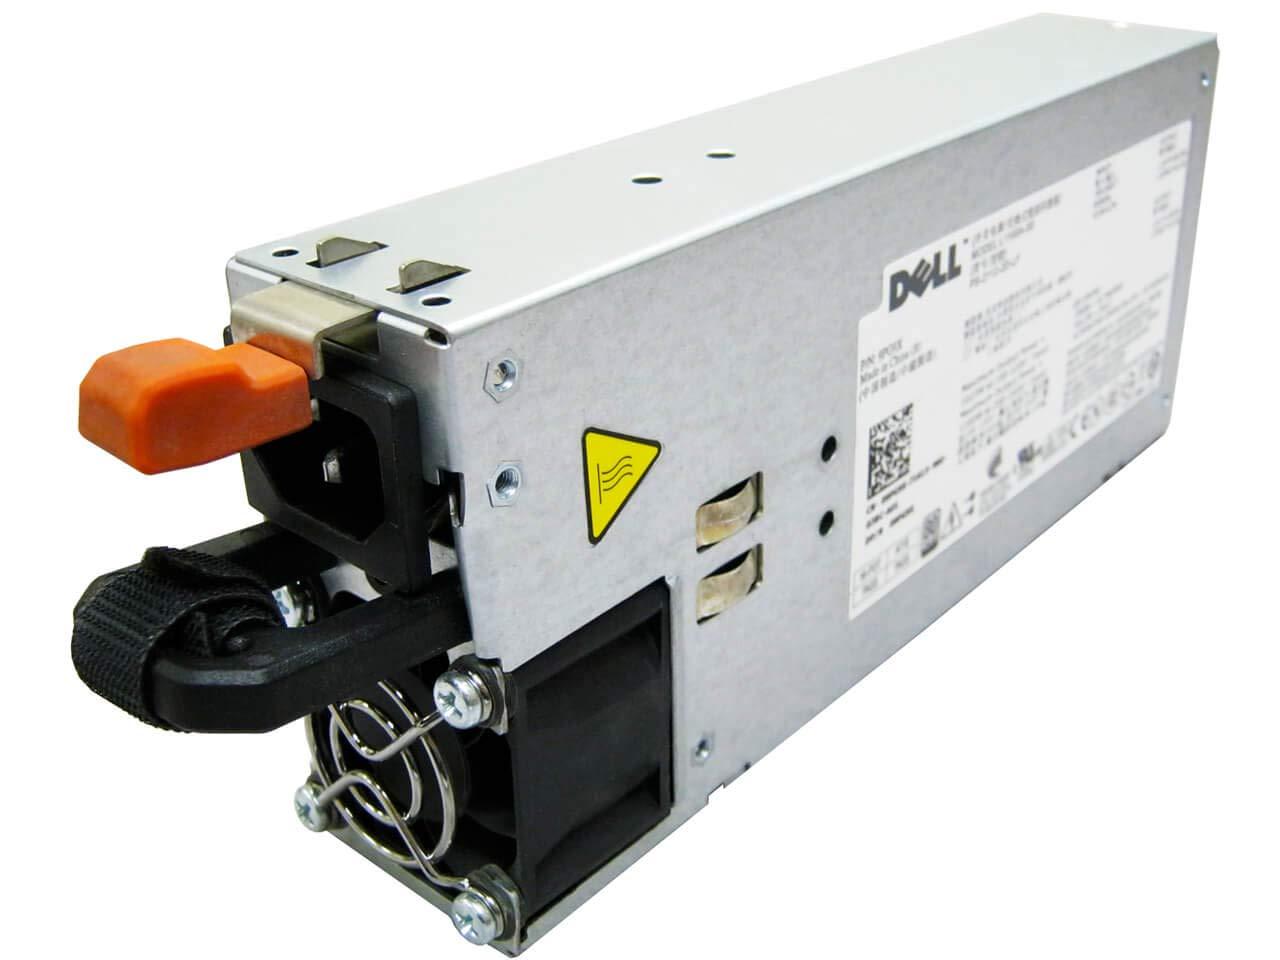 Dell 1100W Redundant Power Supply for PowerEdge T710 Server PN TCVRR GVHPX 3MJJP F6V5T 9PG9X 1Y45R Y613G